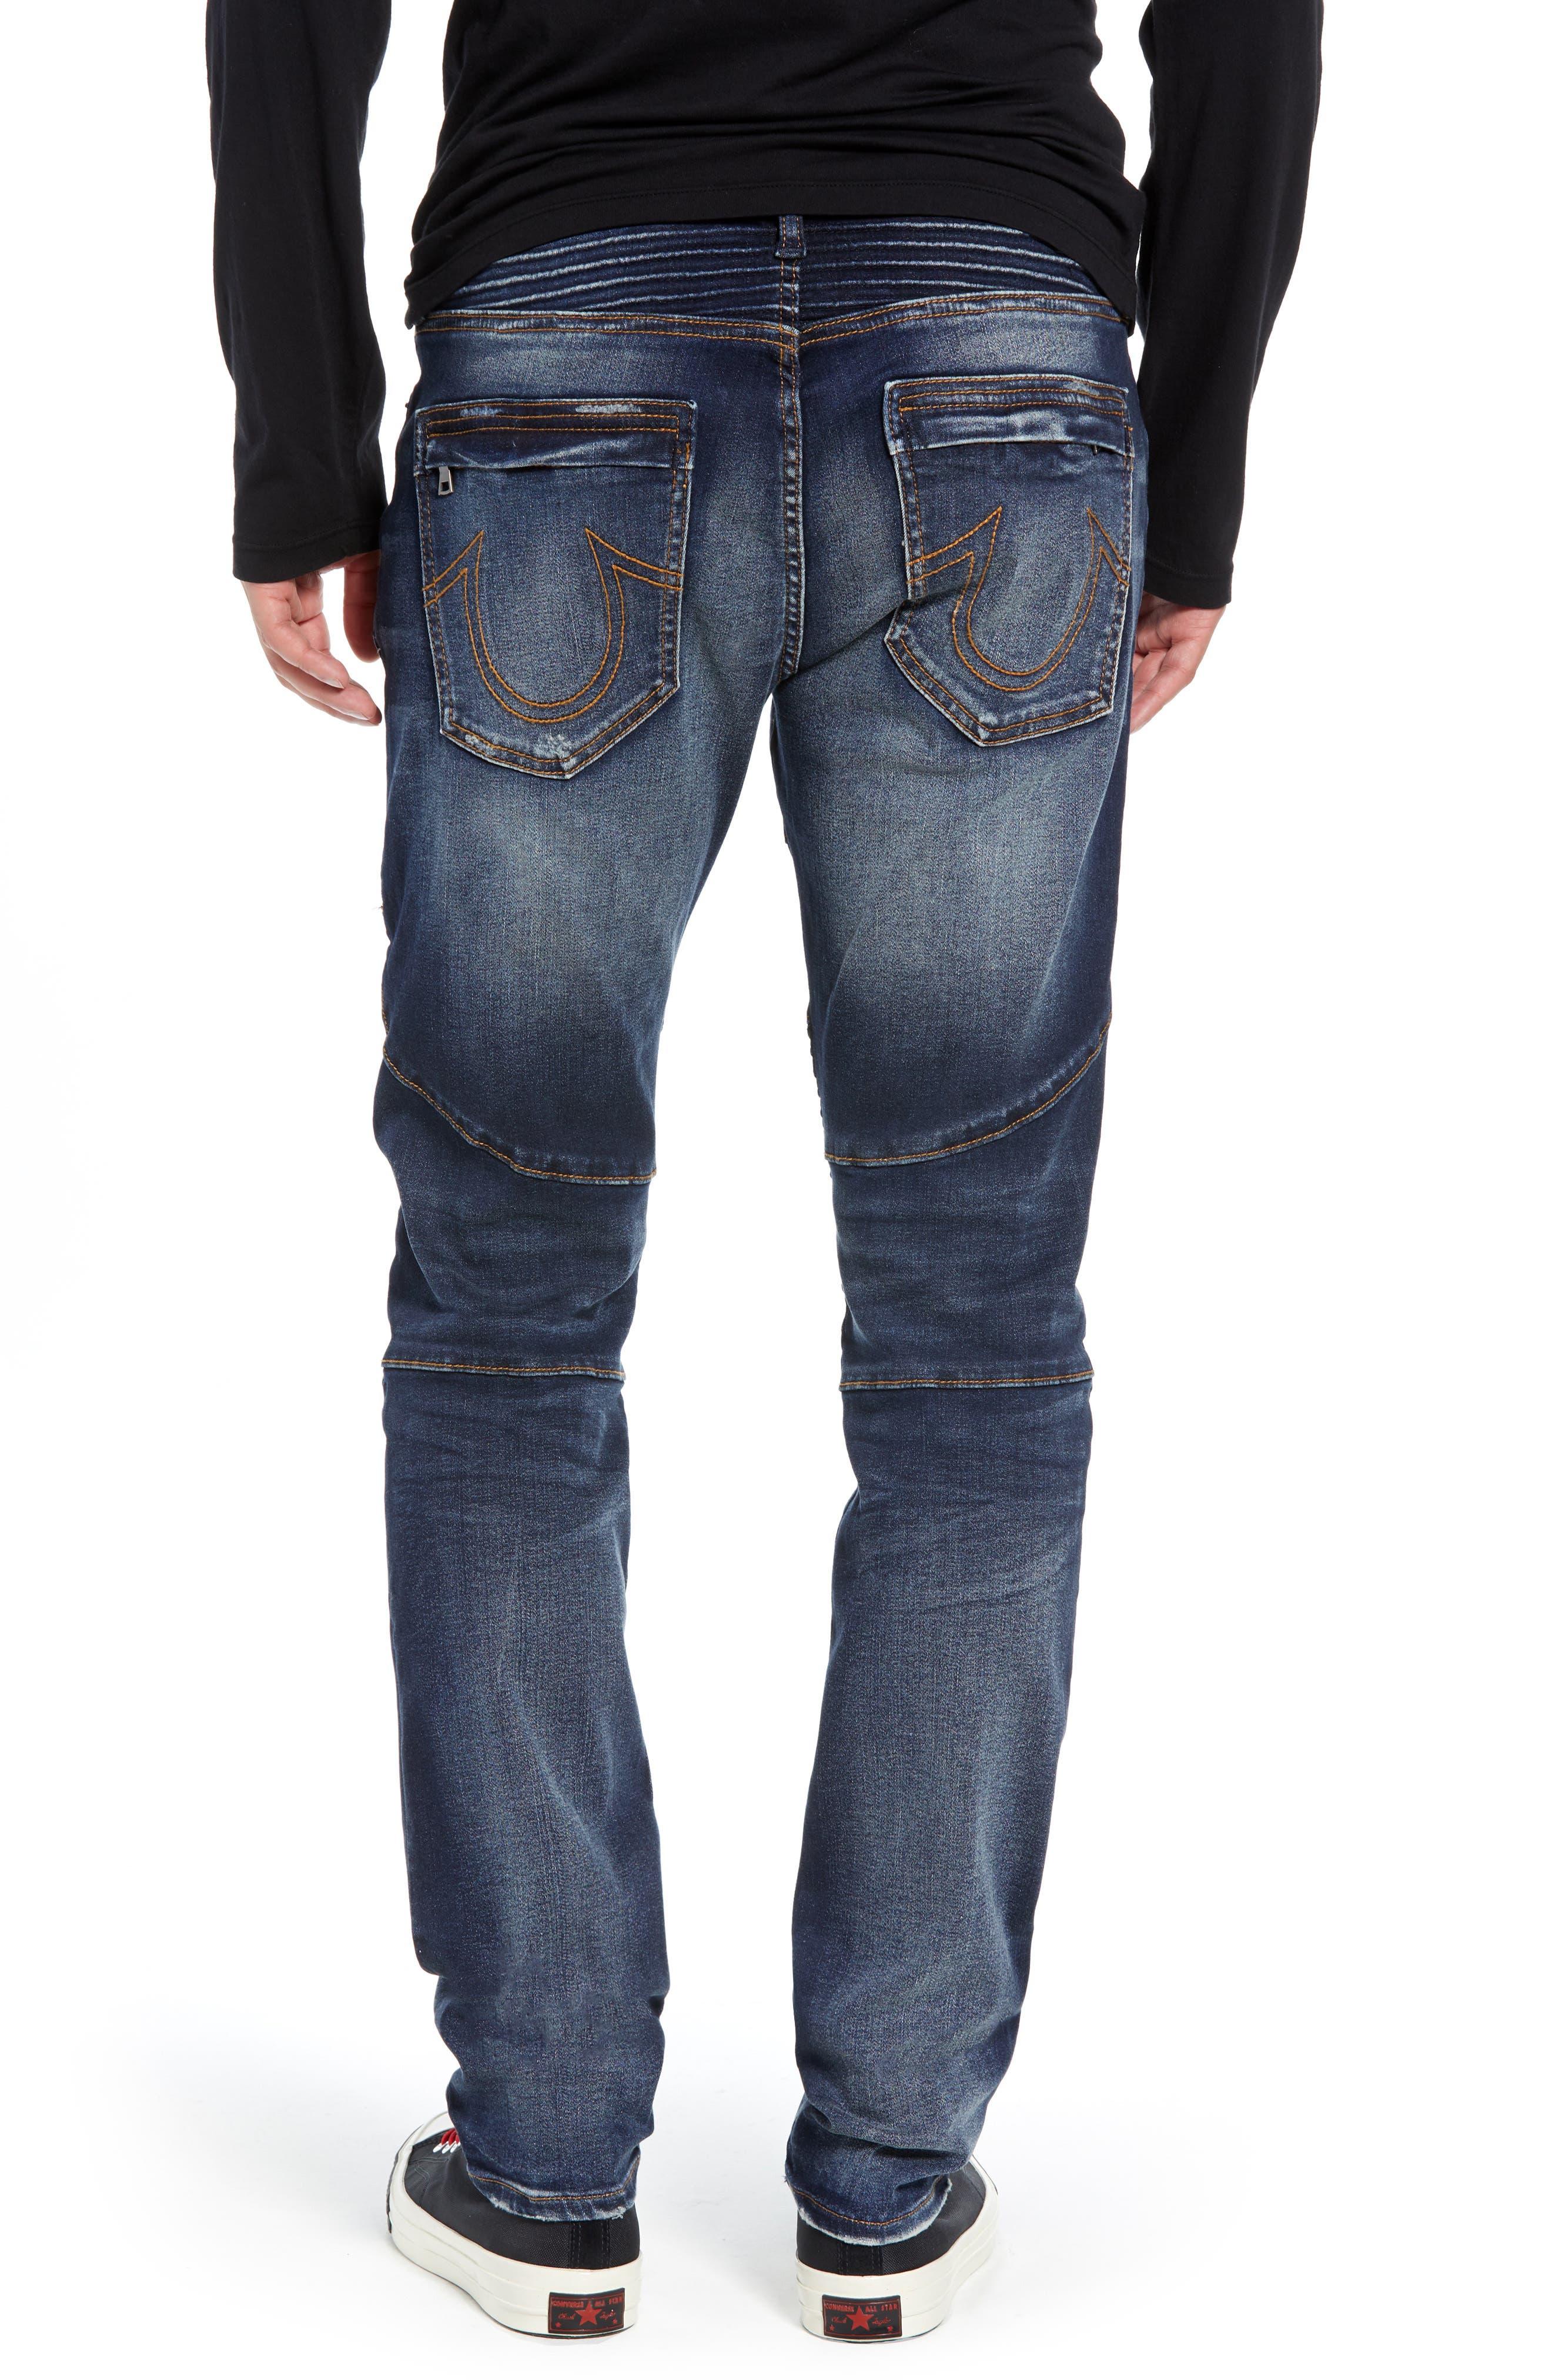 Rocco Skinny Fit Moto Jeans,                             Alternate thumbnail 2, color,                             MINERAL ASPHALT